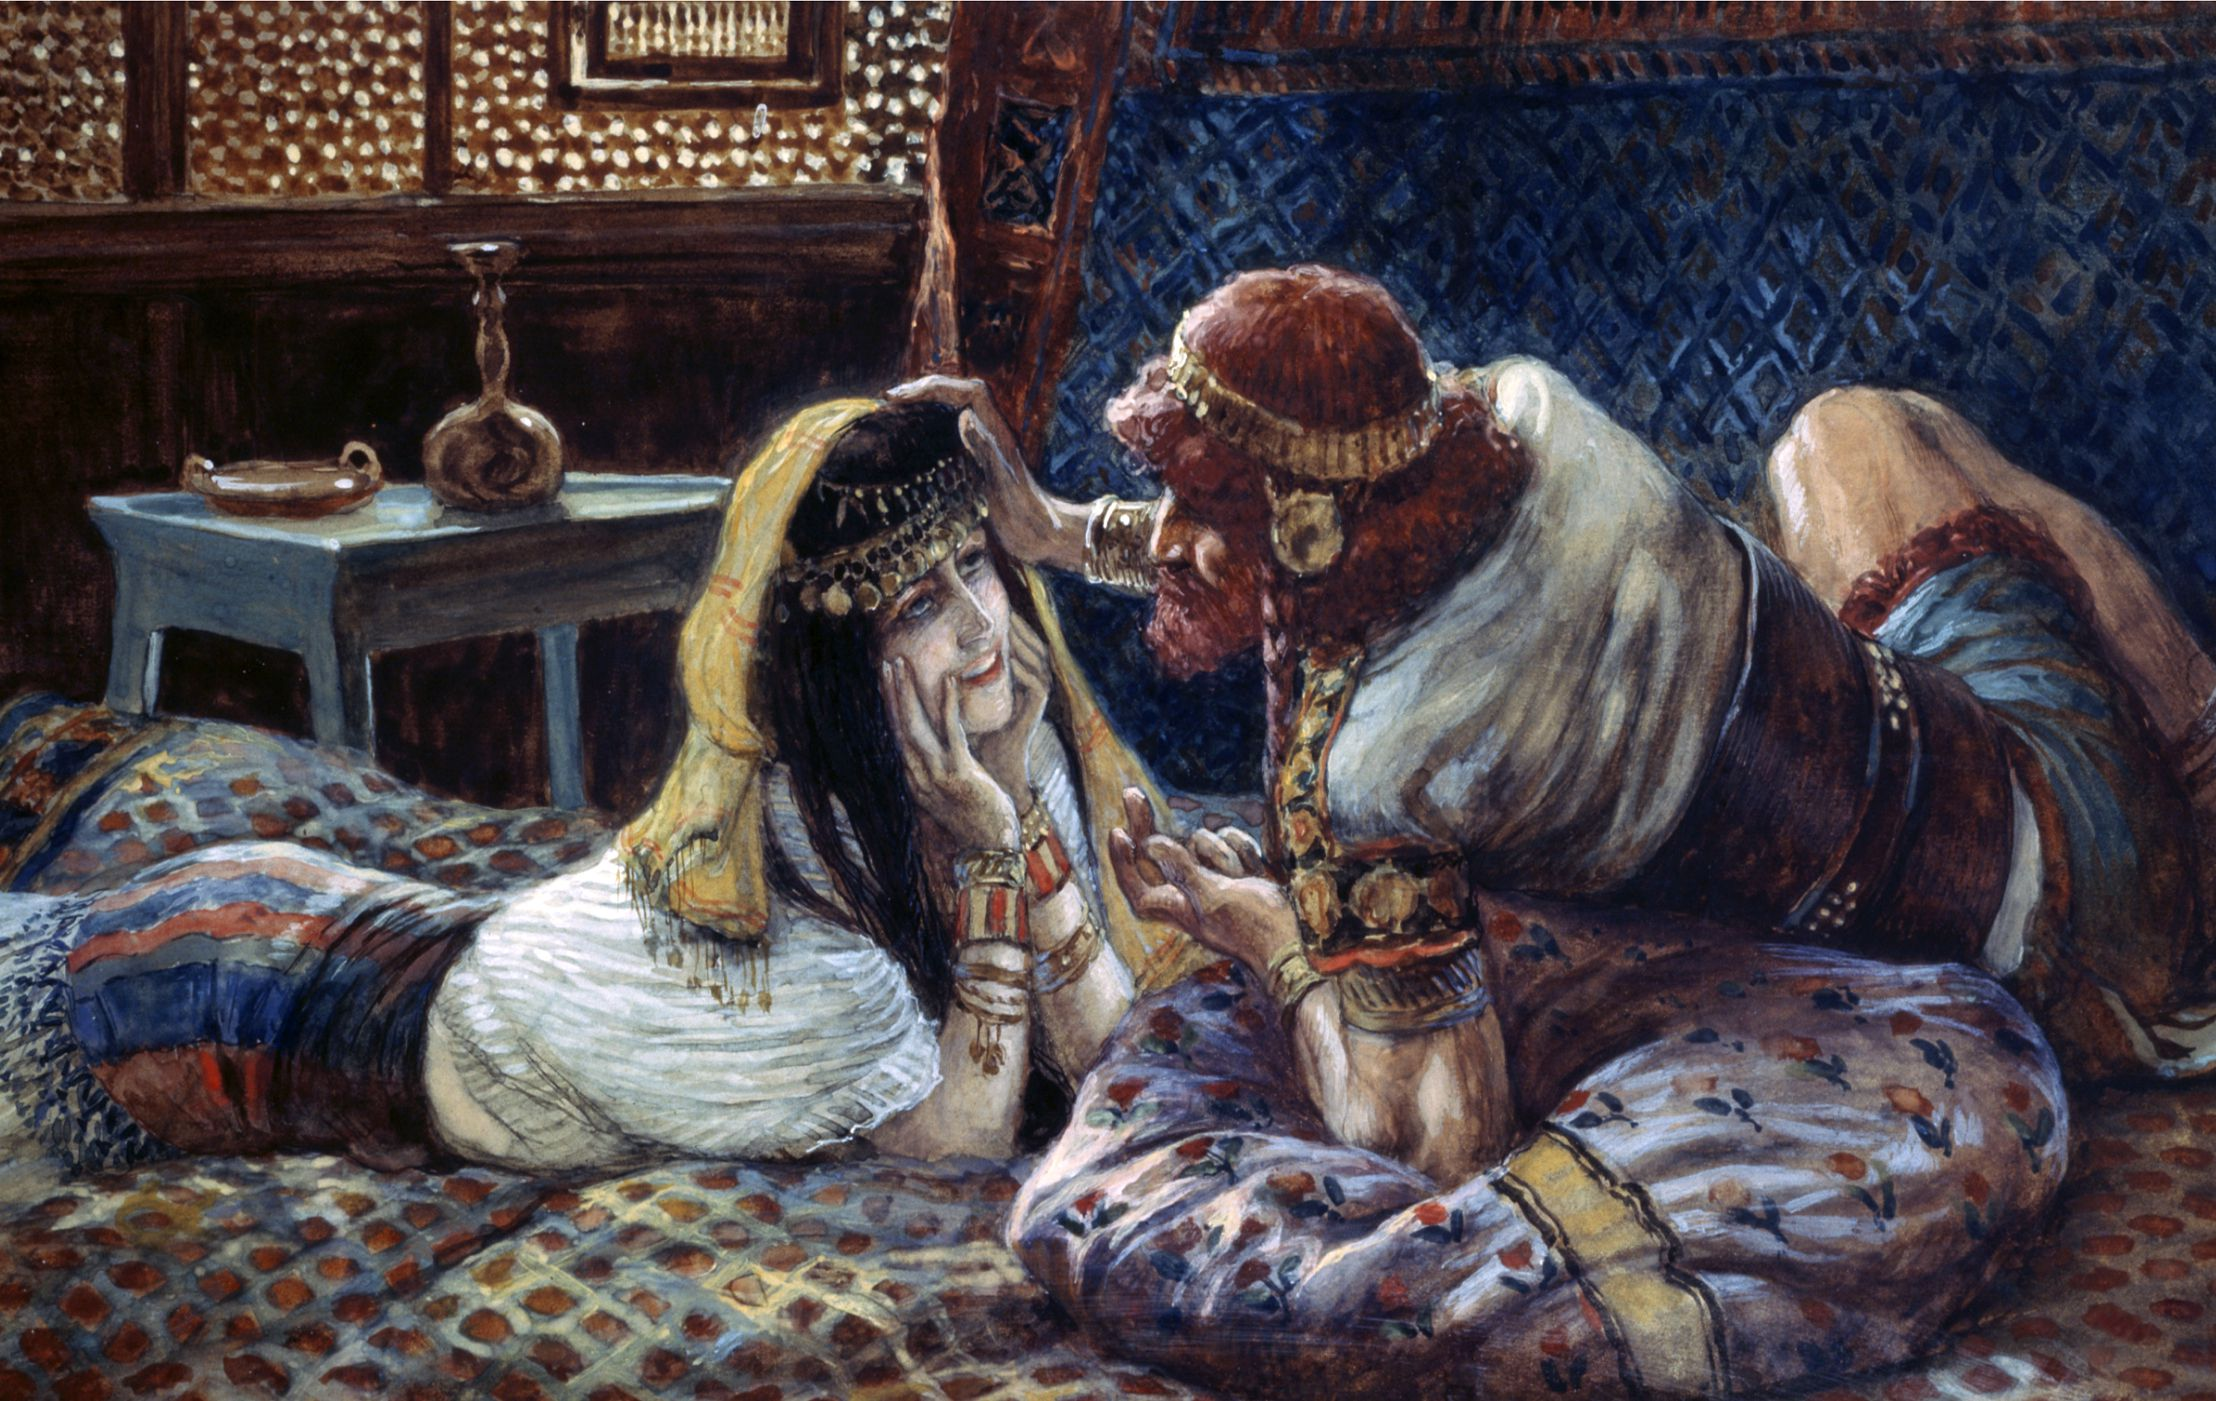 Samson And Delilah Bible Story Study Guide